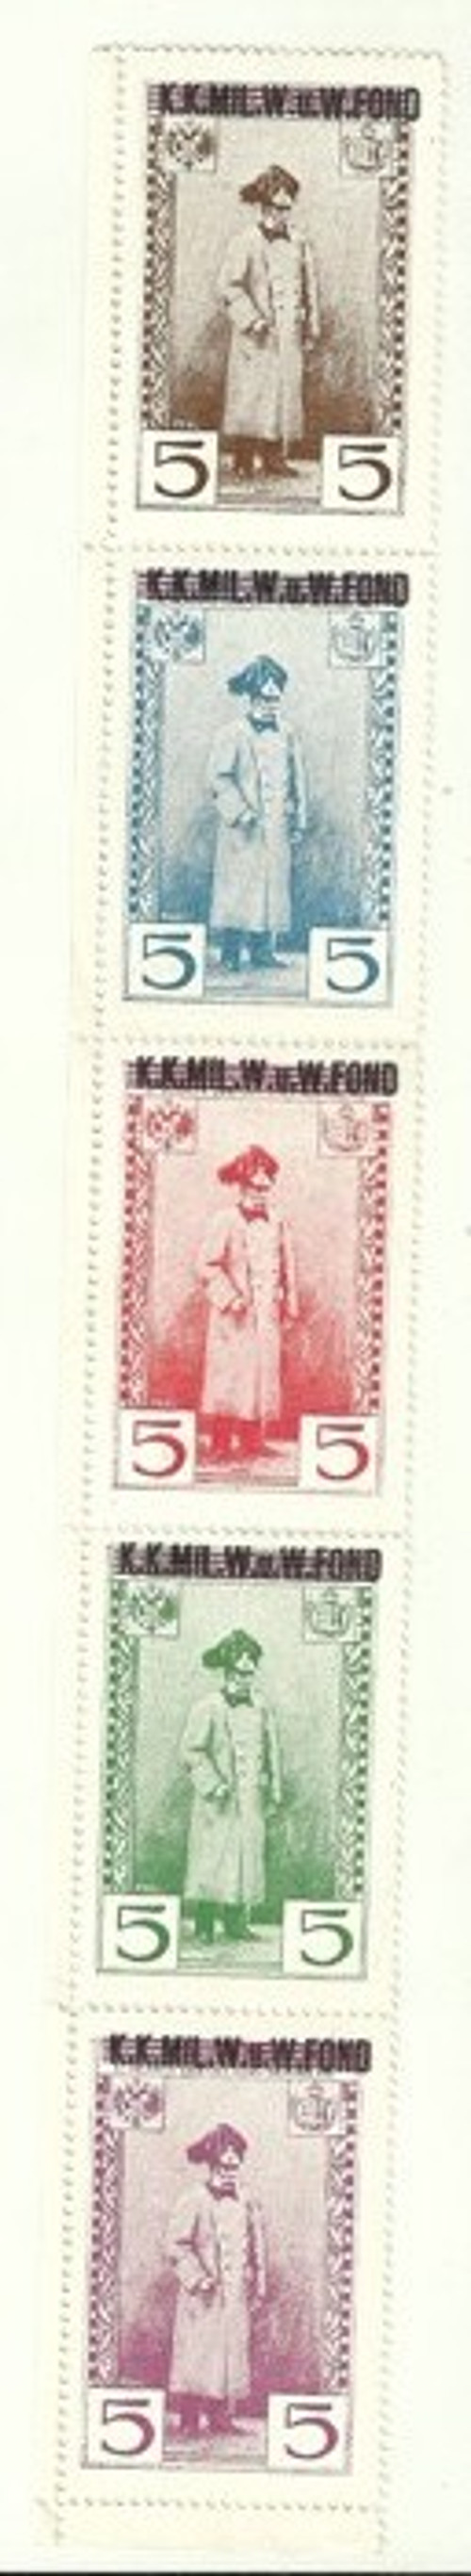 5x Zálepka František Josef I FJI K.K. Fond